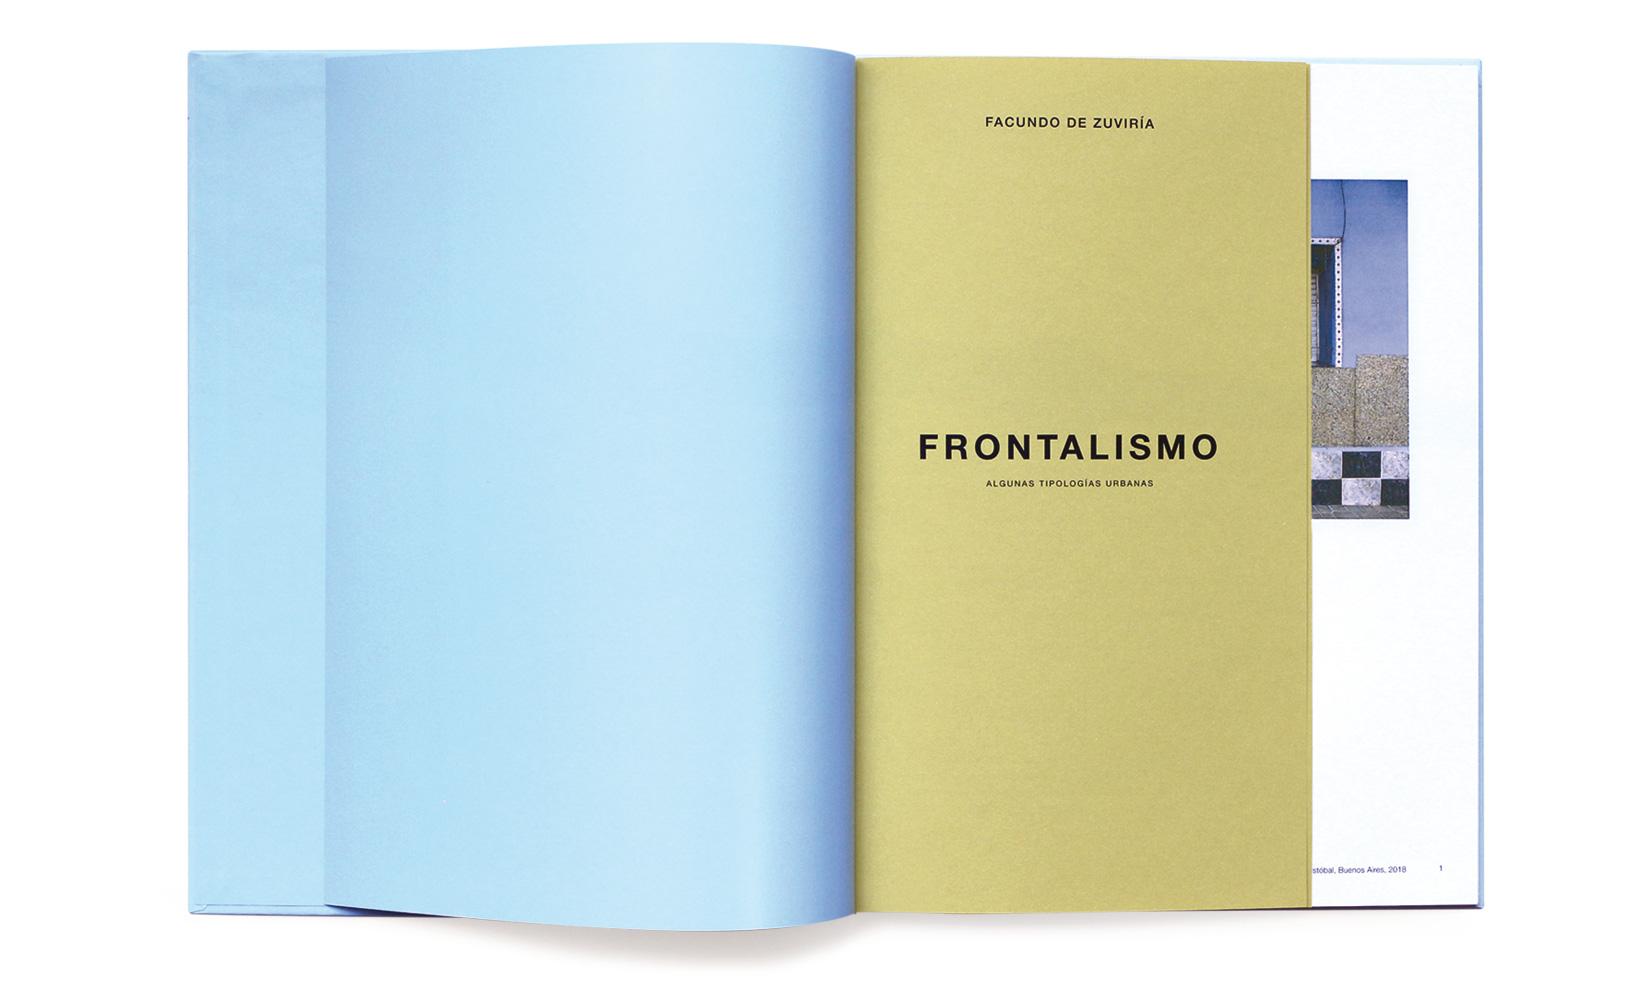 FRONTALISMO-FACUNDO-DE-ZUVIRIA-TOLUCA-STUDIO-OLIVIER-ANDREOTTI-3.jpg